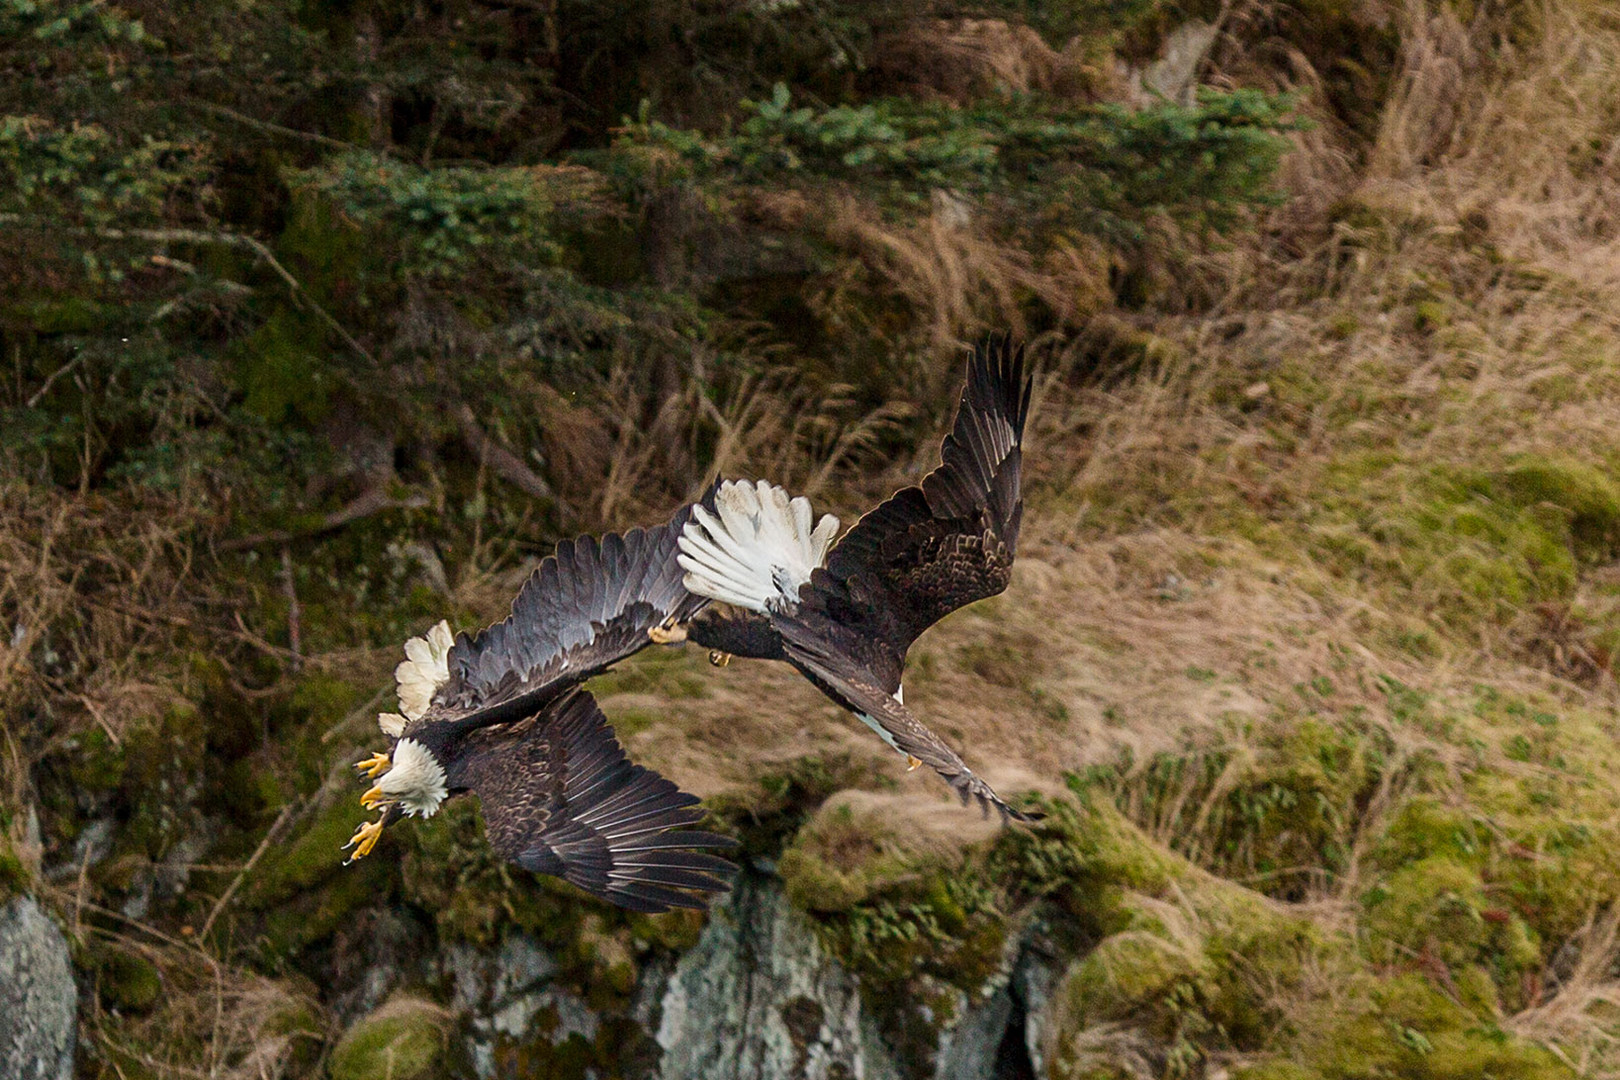 eagle-fight-midair-fb-(1-of-1).jpg